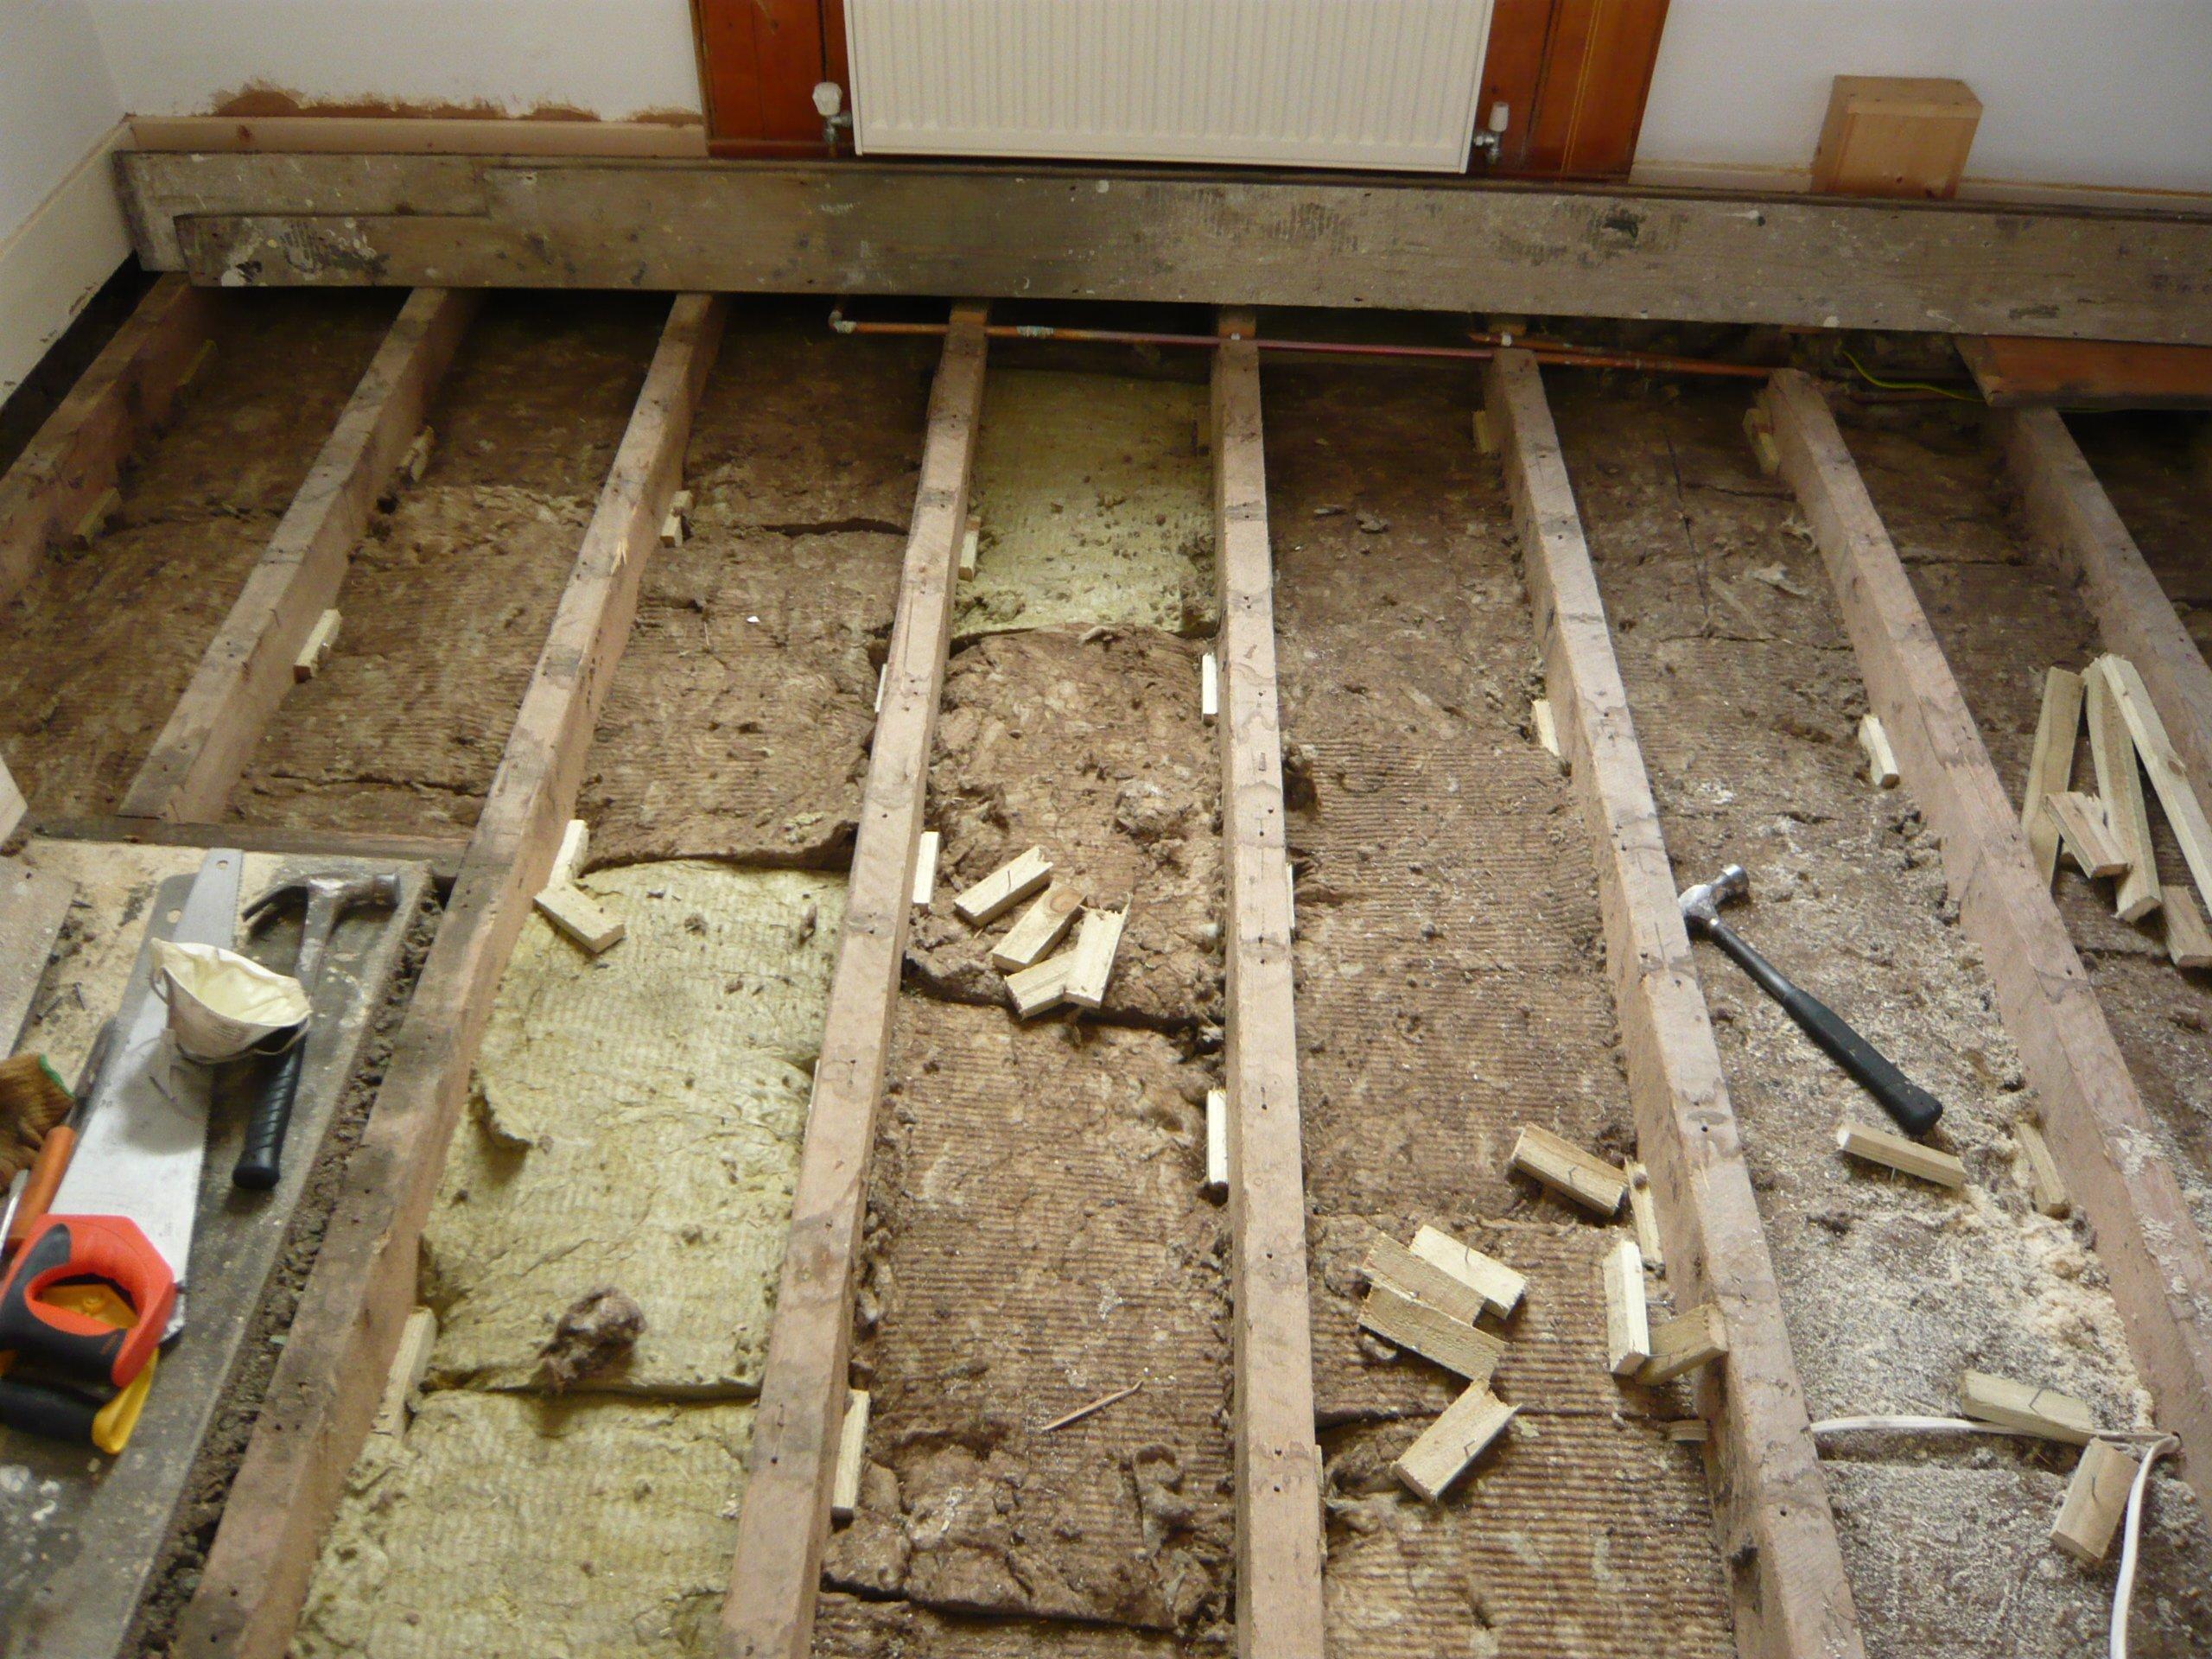 Ground Floor Insulation Can Reduce